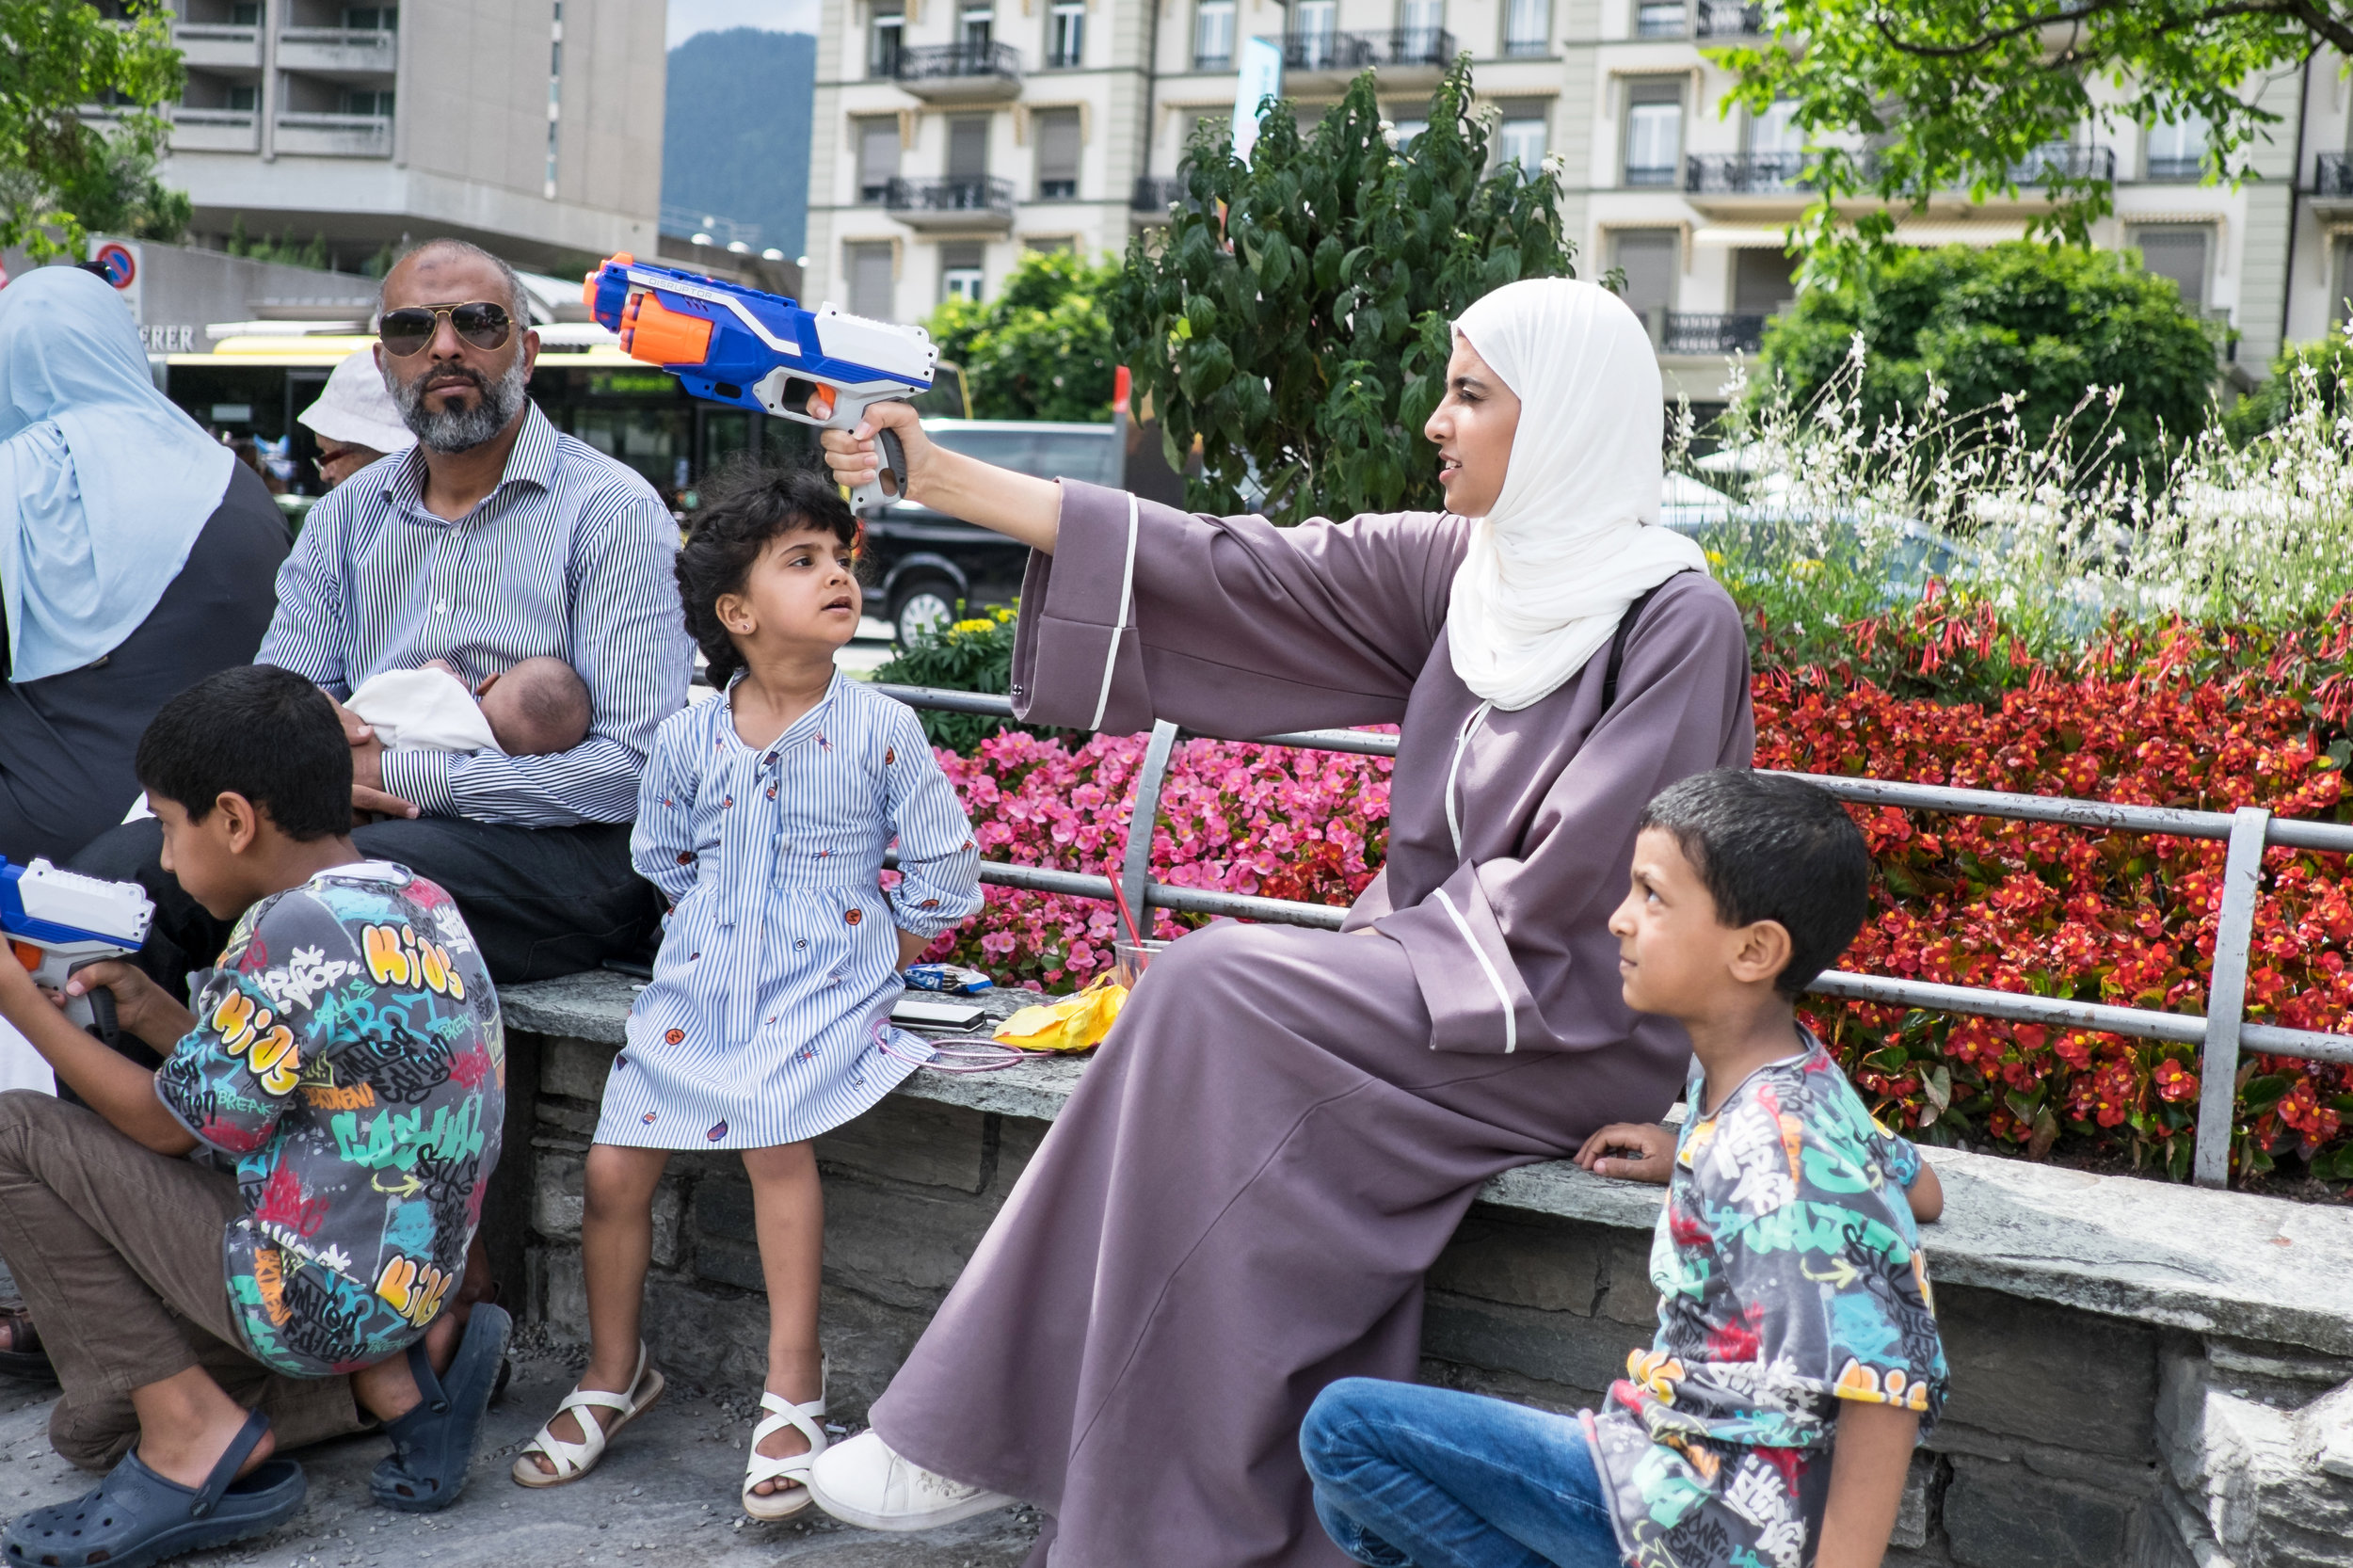 01_Interlaken_Muslime_MarcoZanoni.JPG